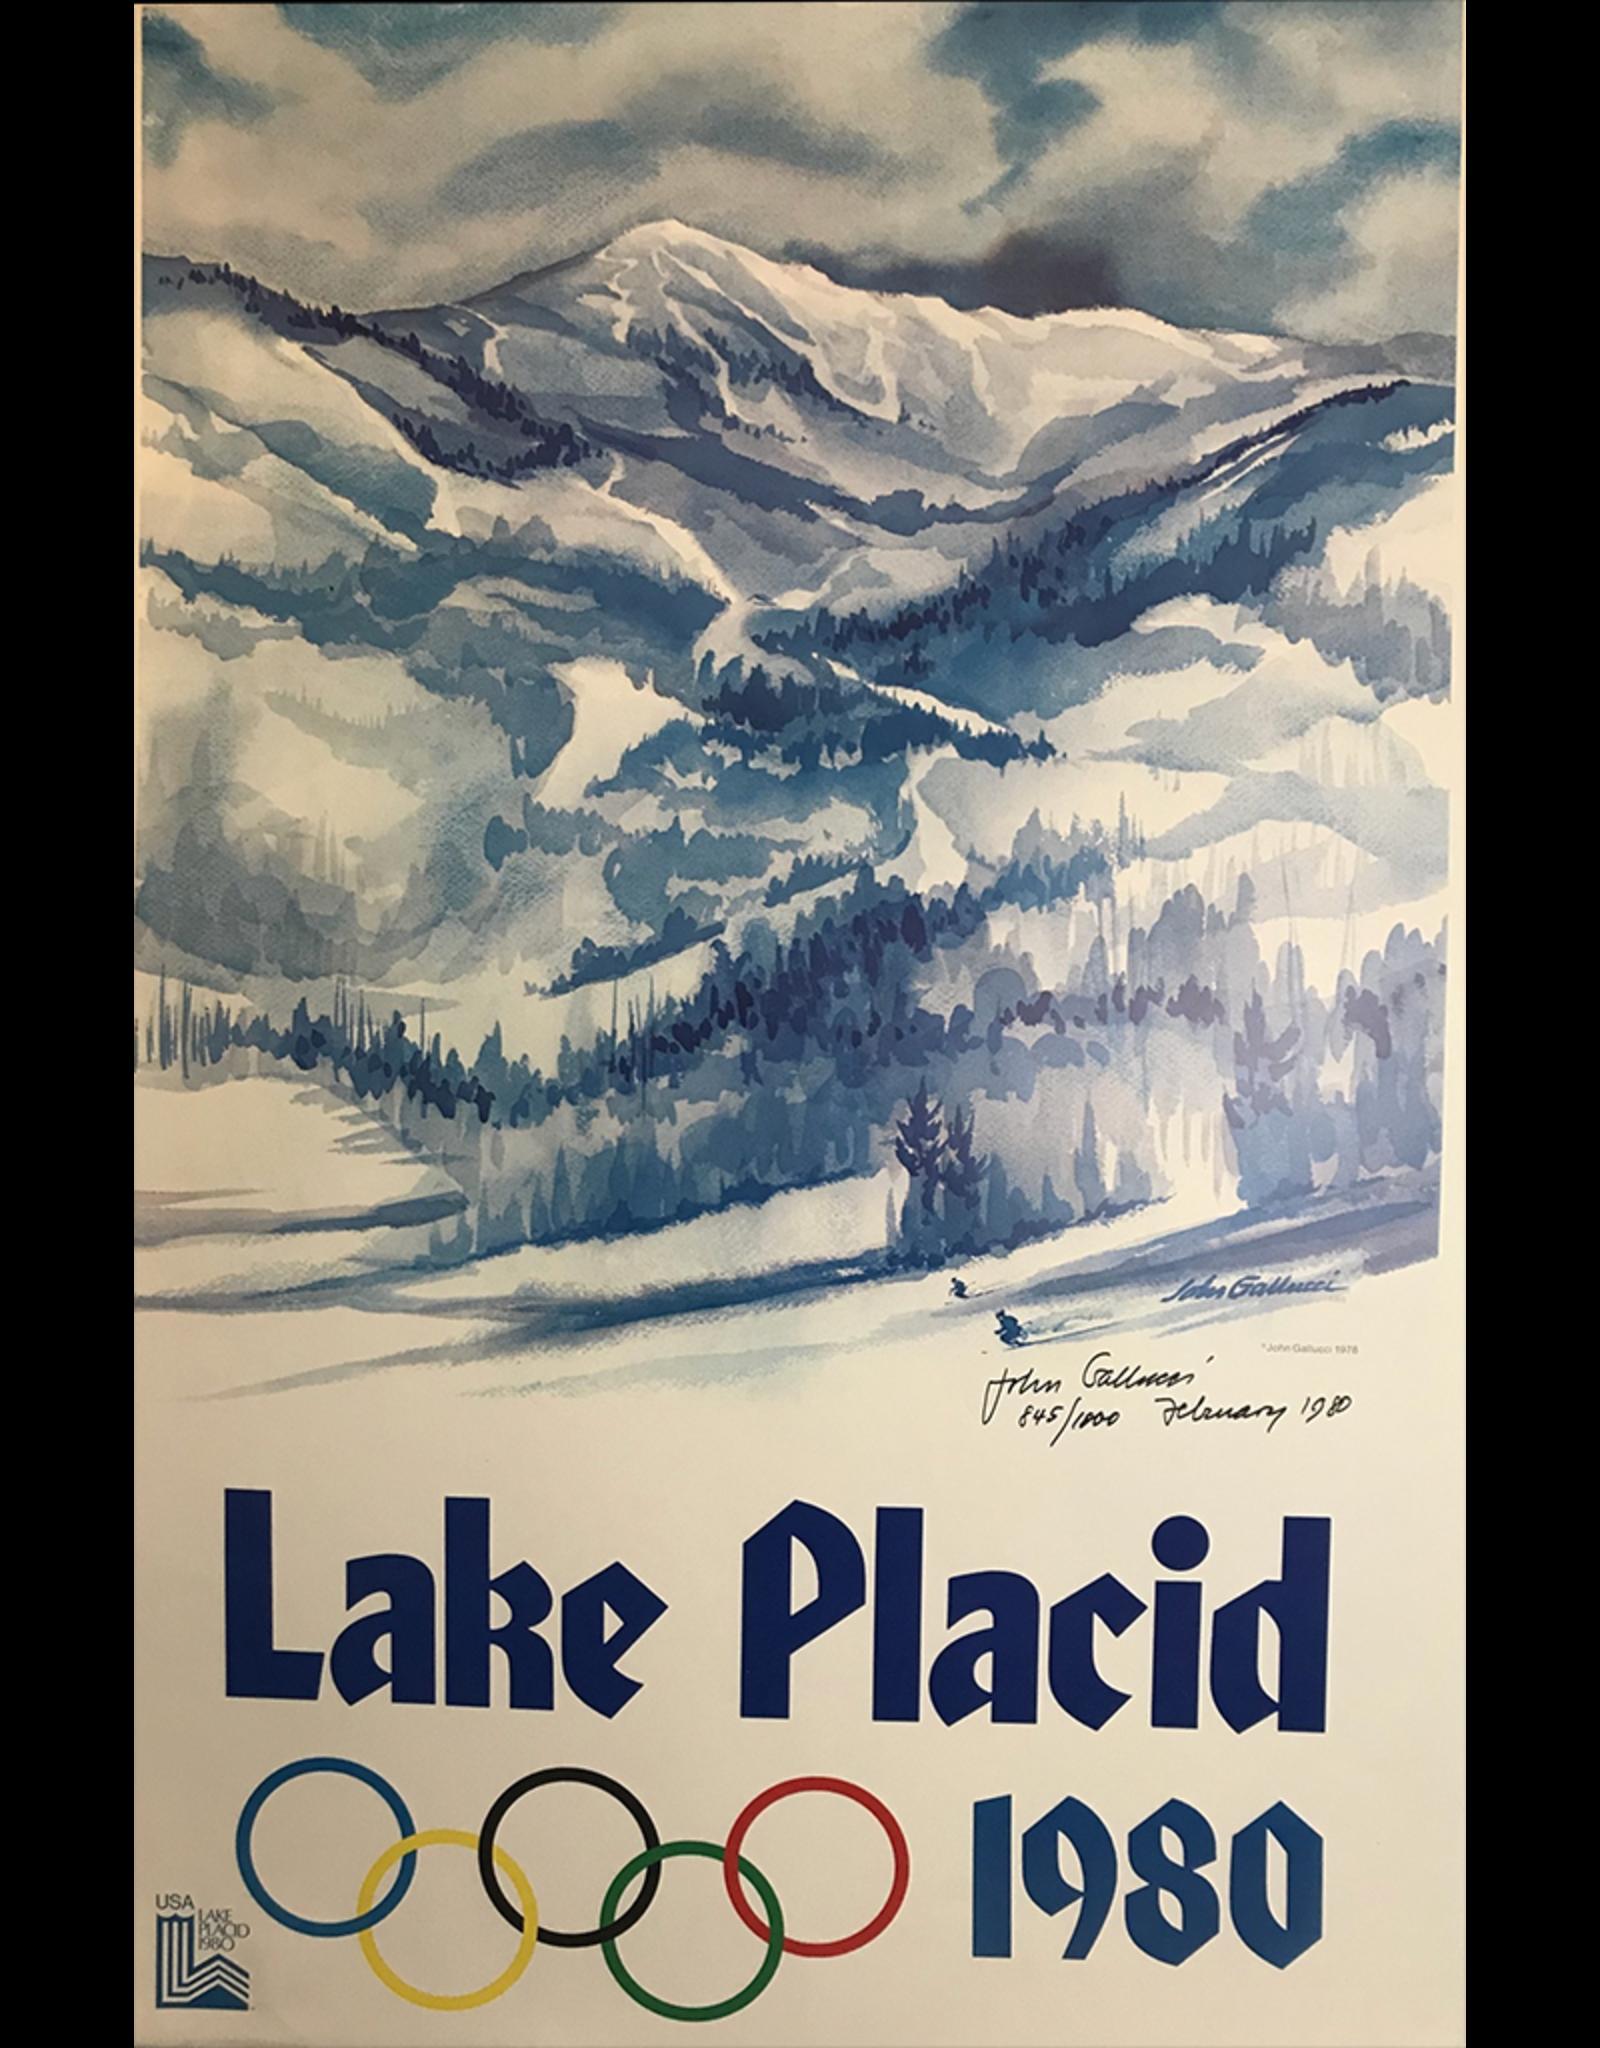 SPV Lake Placid 1980